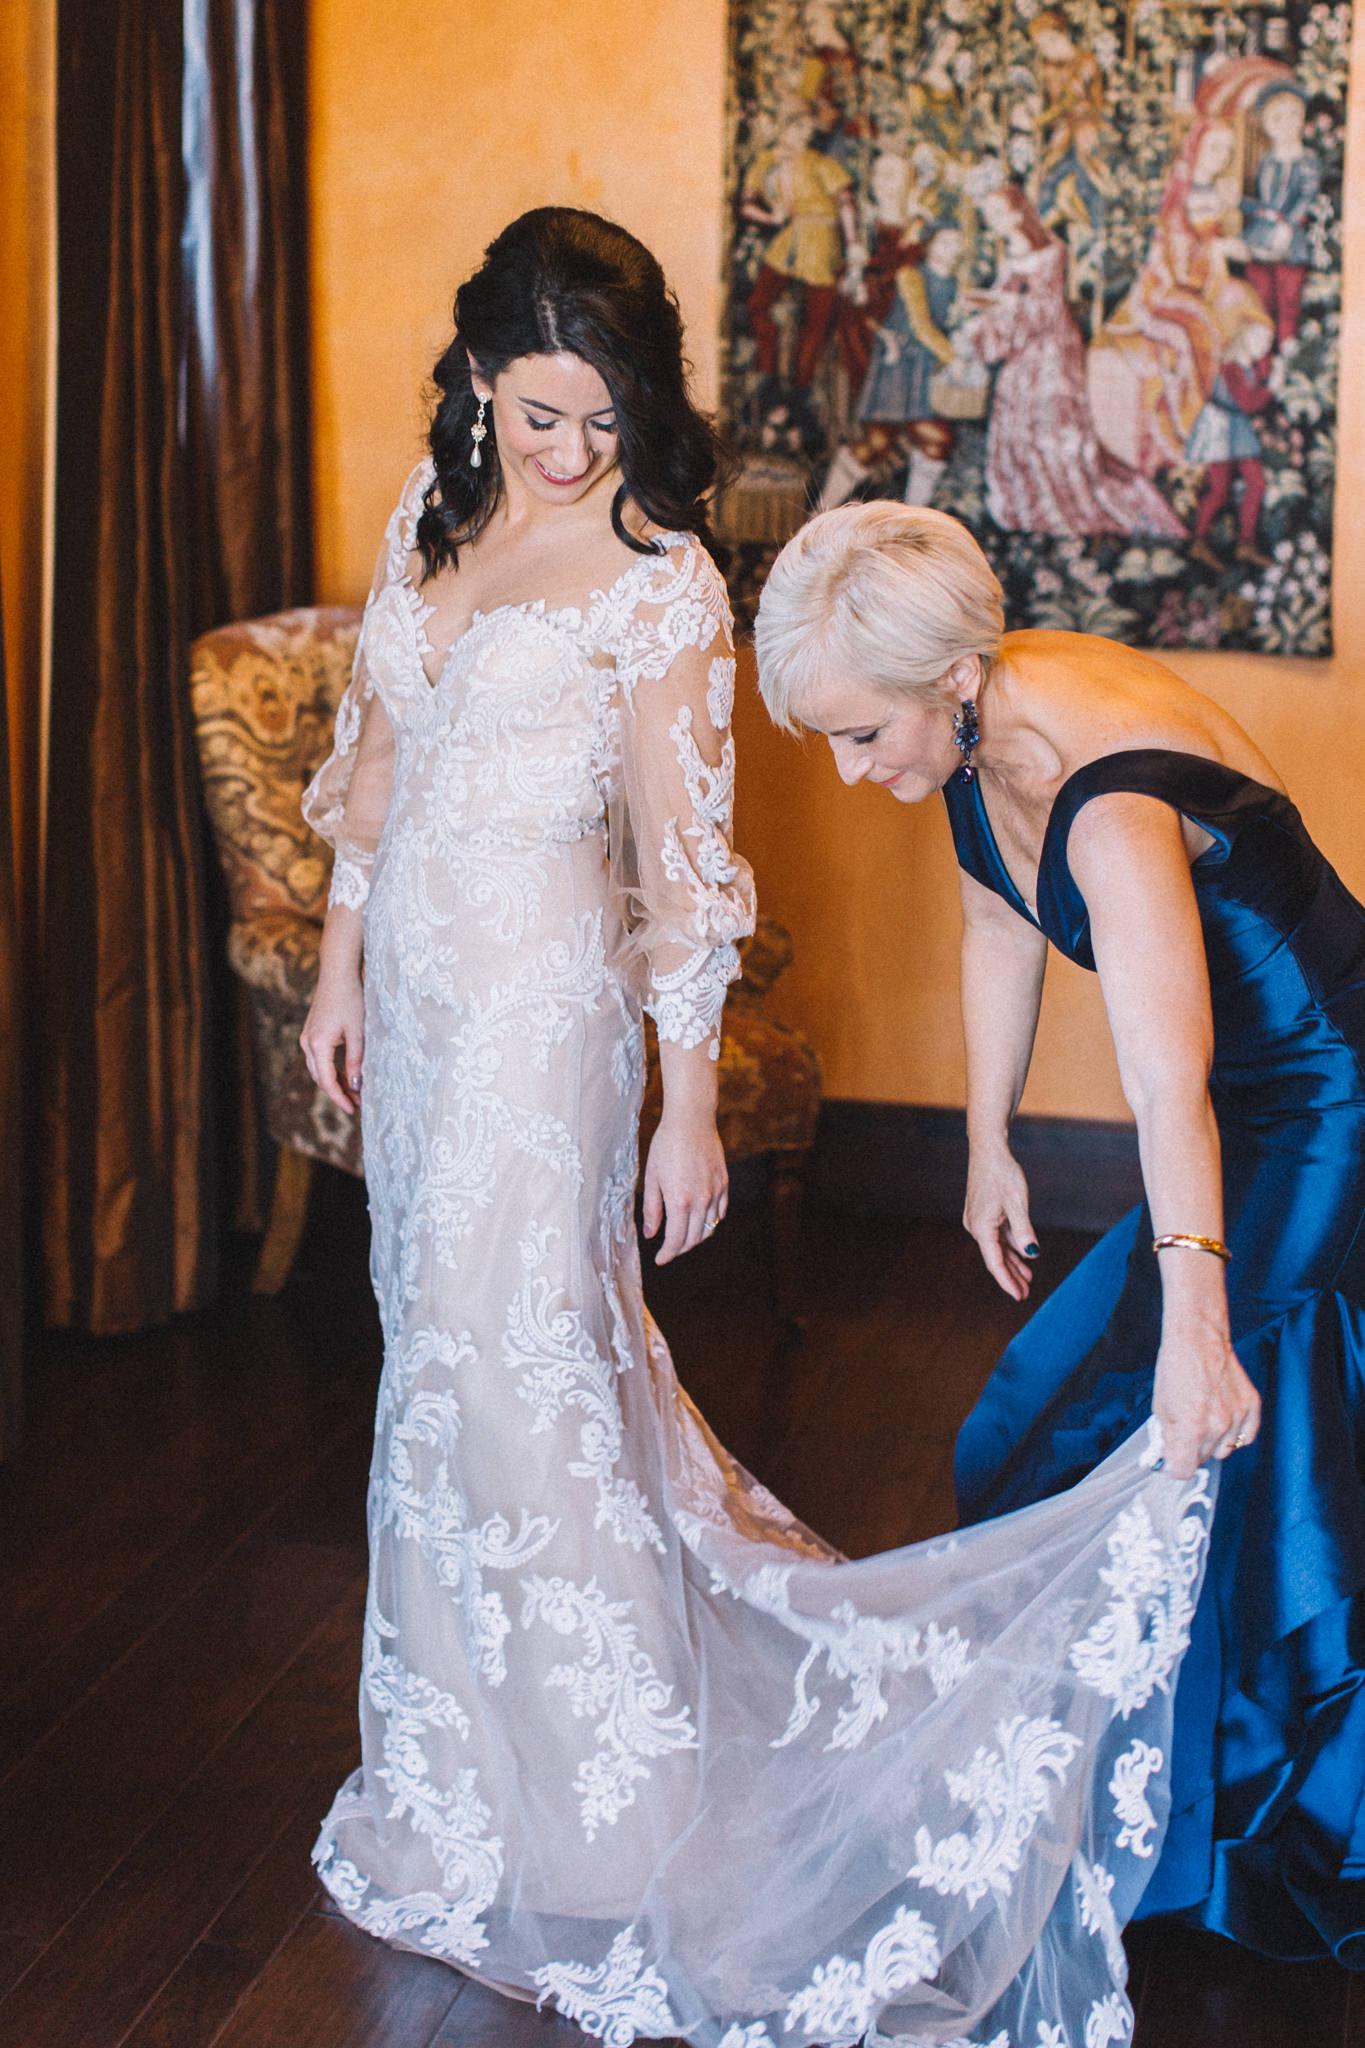 bride with mom putting on wedding dress